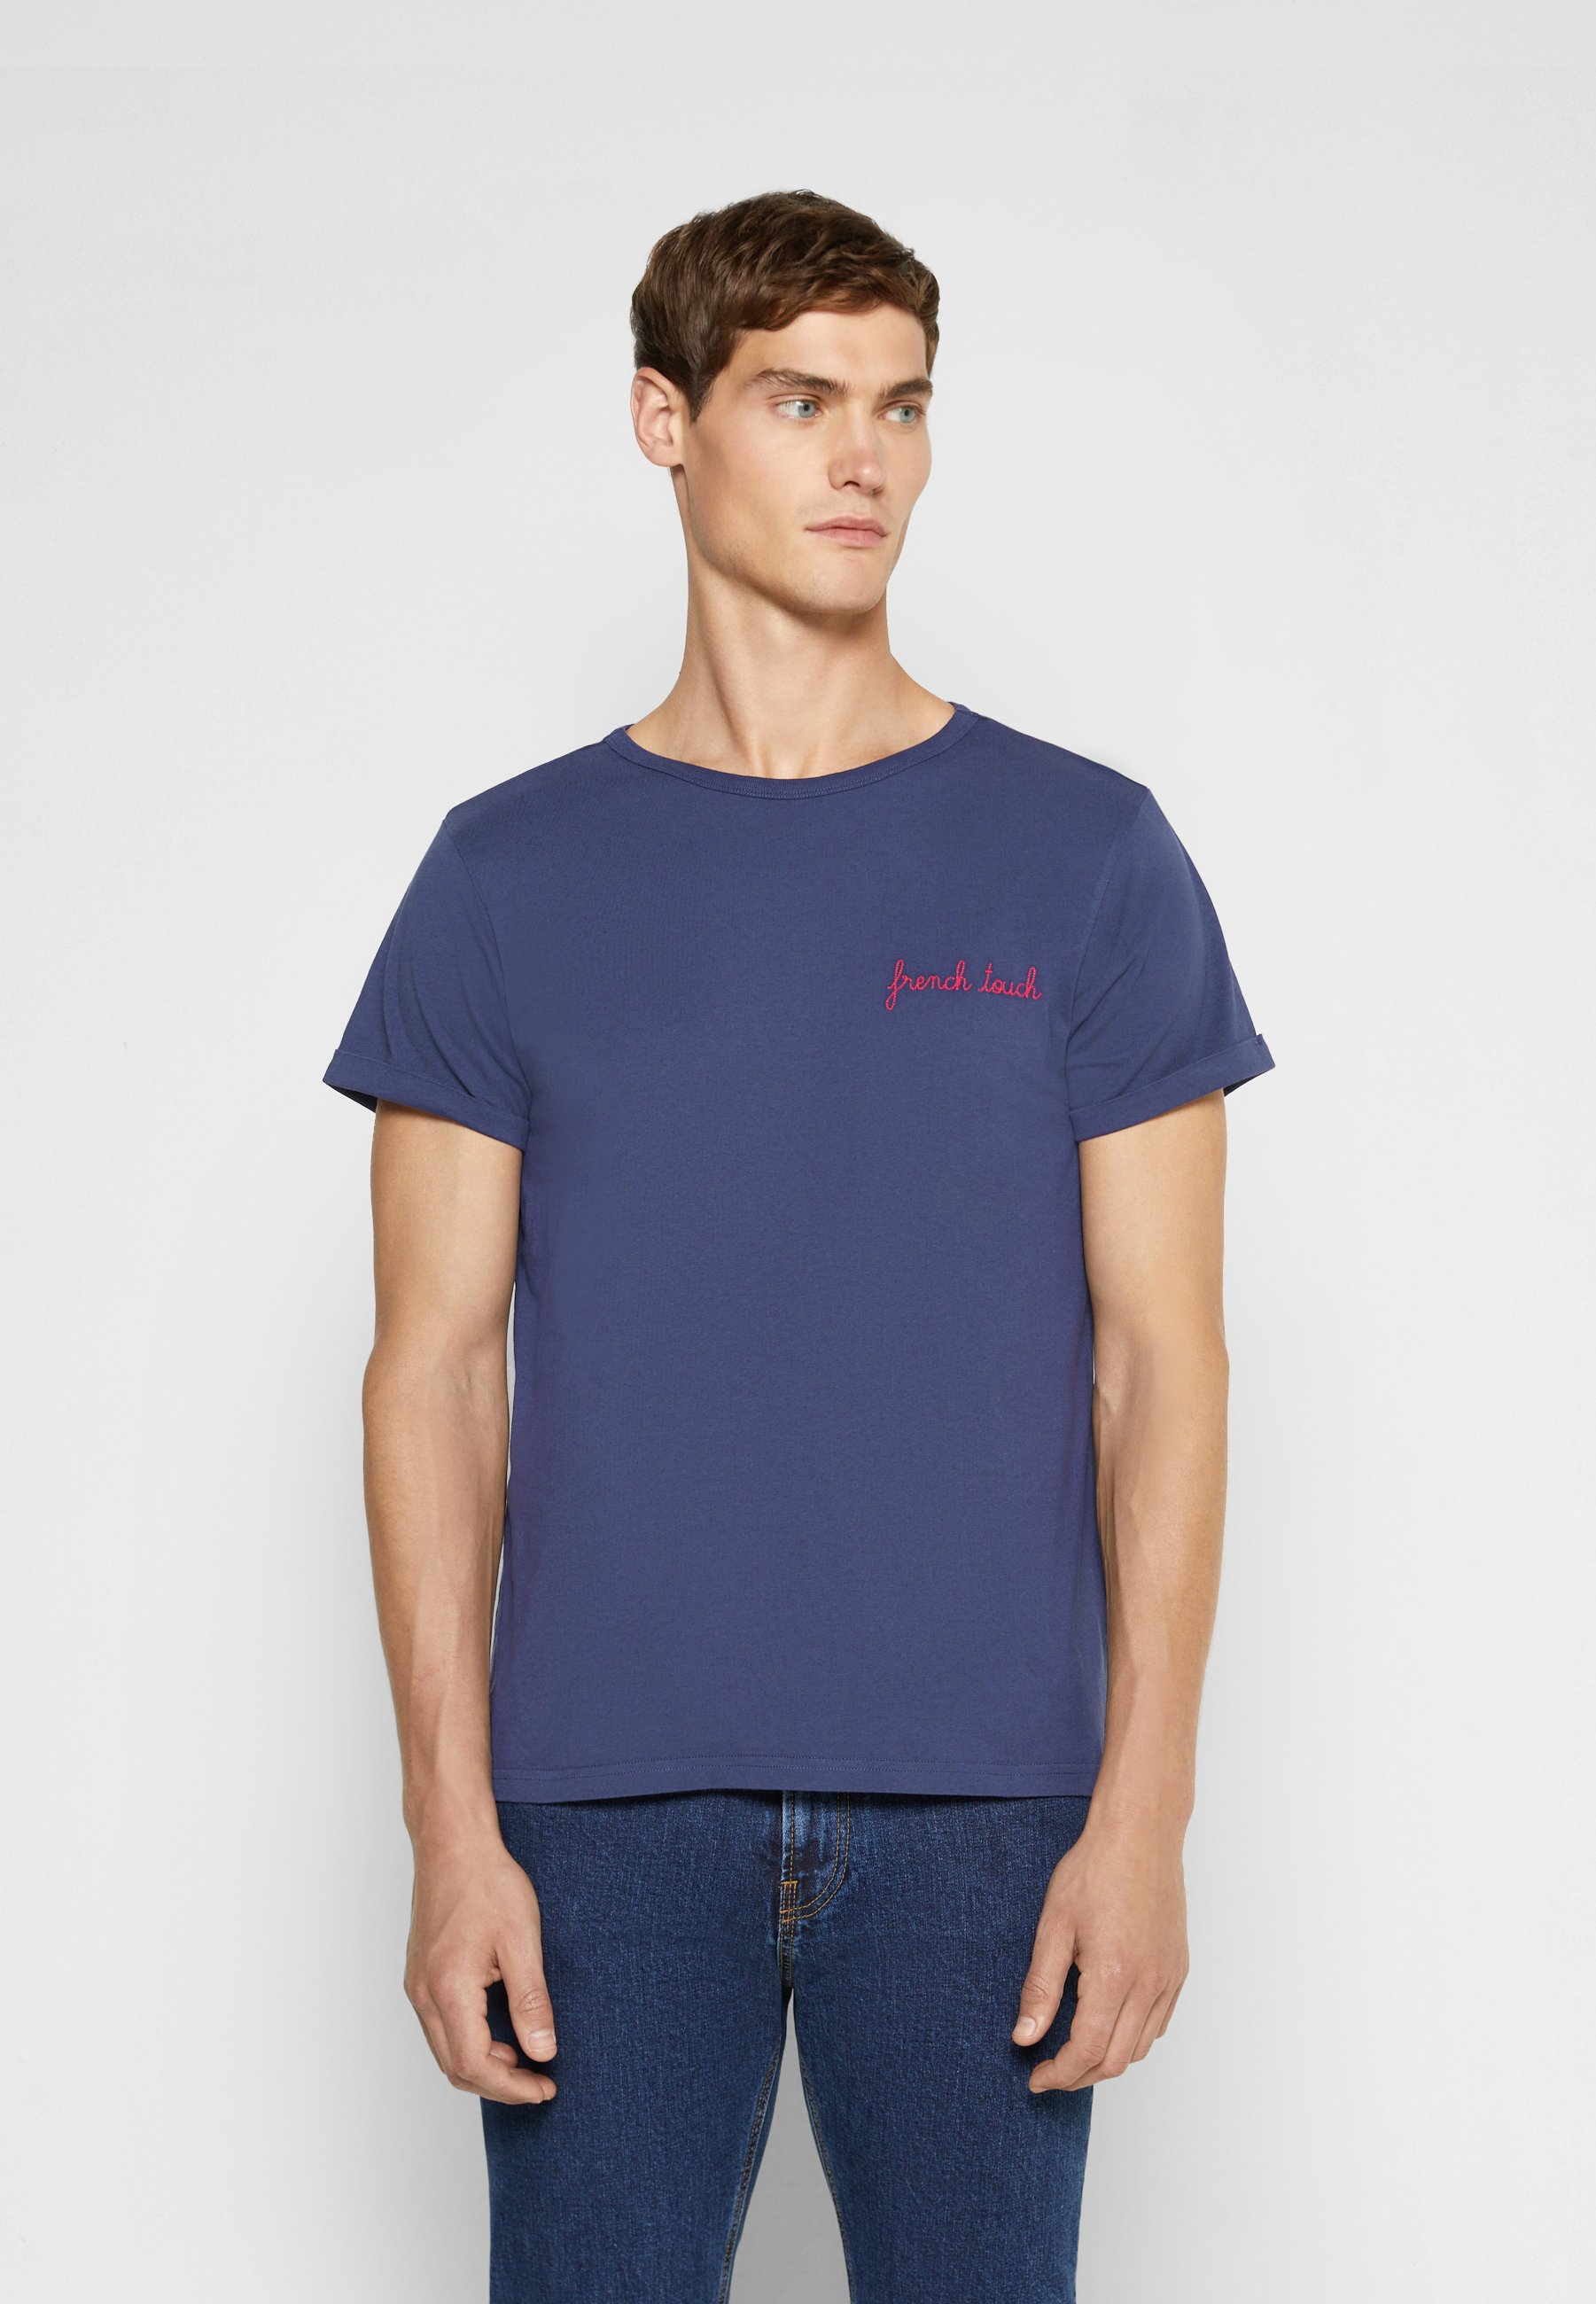 Homme POITOU FRENCH TOUCH - T-shirt basique